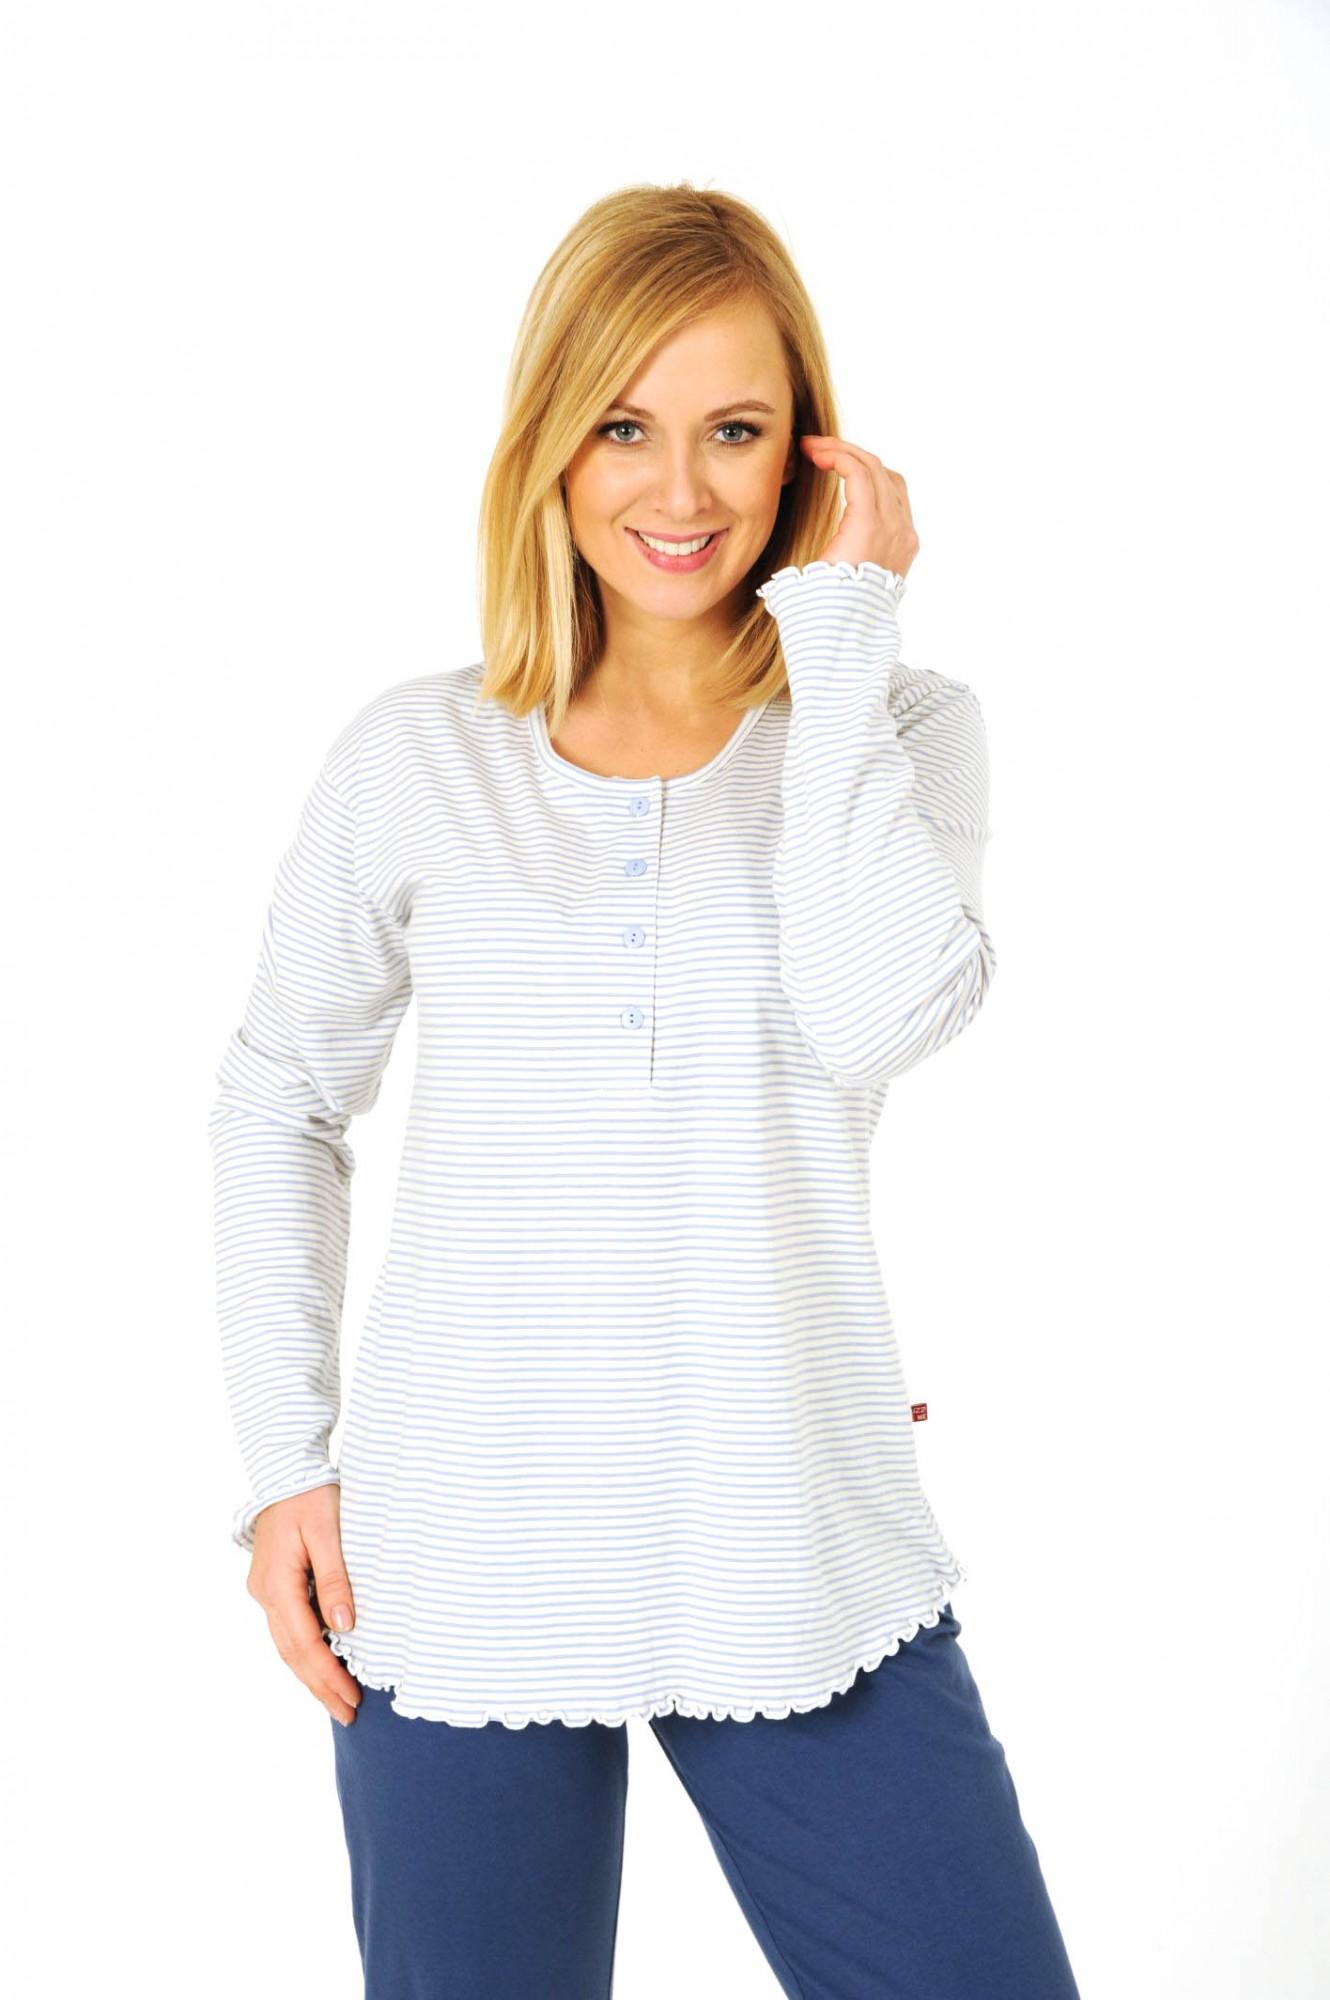 Damen Shirt  Oberteil - langarm Mix & Match geringelt  251 219 90 158 – Bild 3